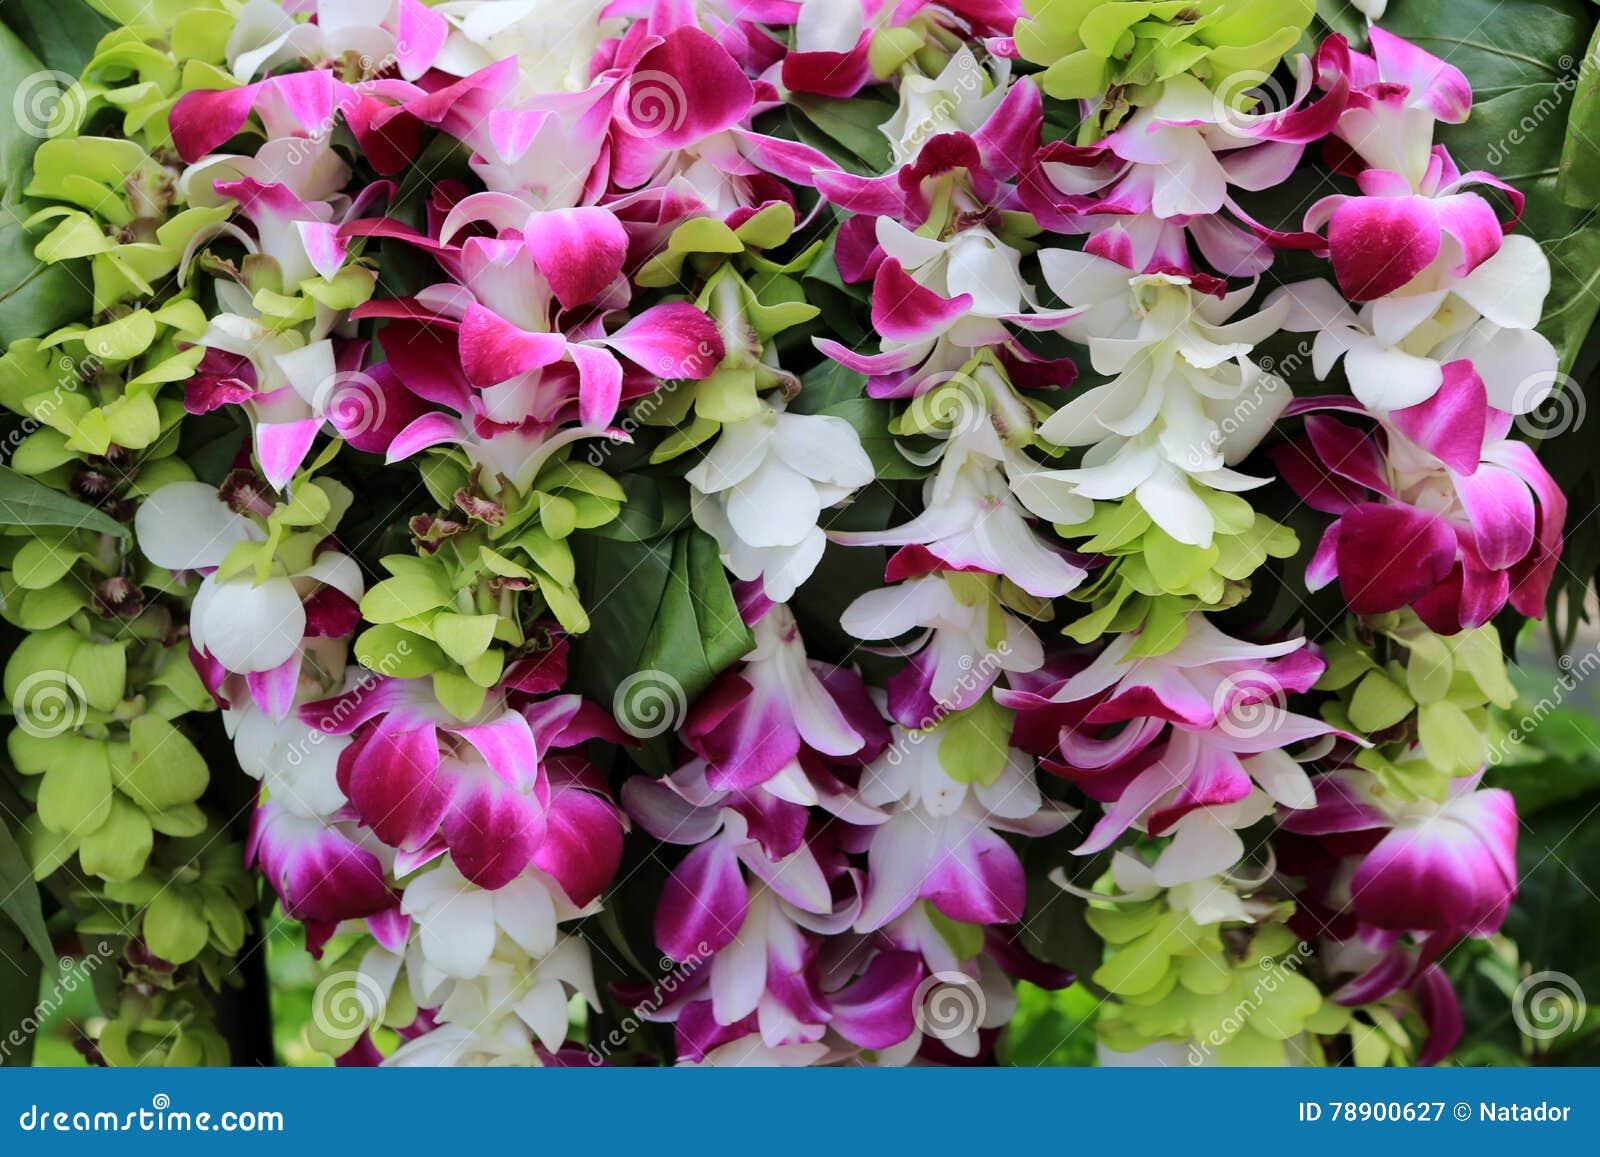 Hawaiian orchid lei stock image image of leaves plant 78900627 hawaiian orchid lei izmirmasajfo